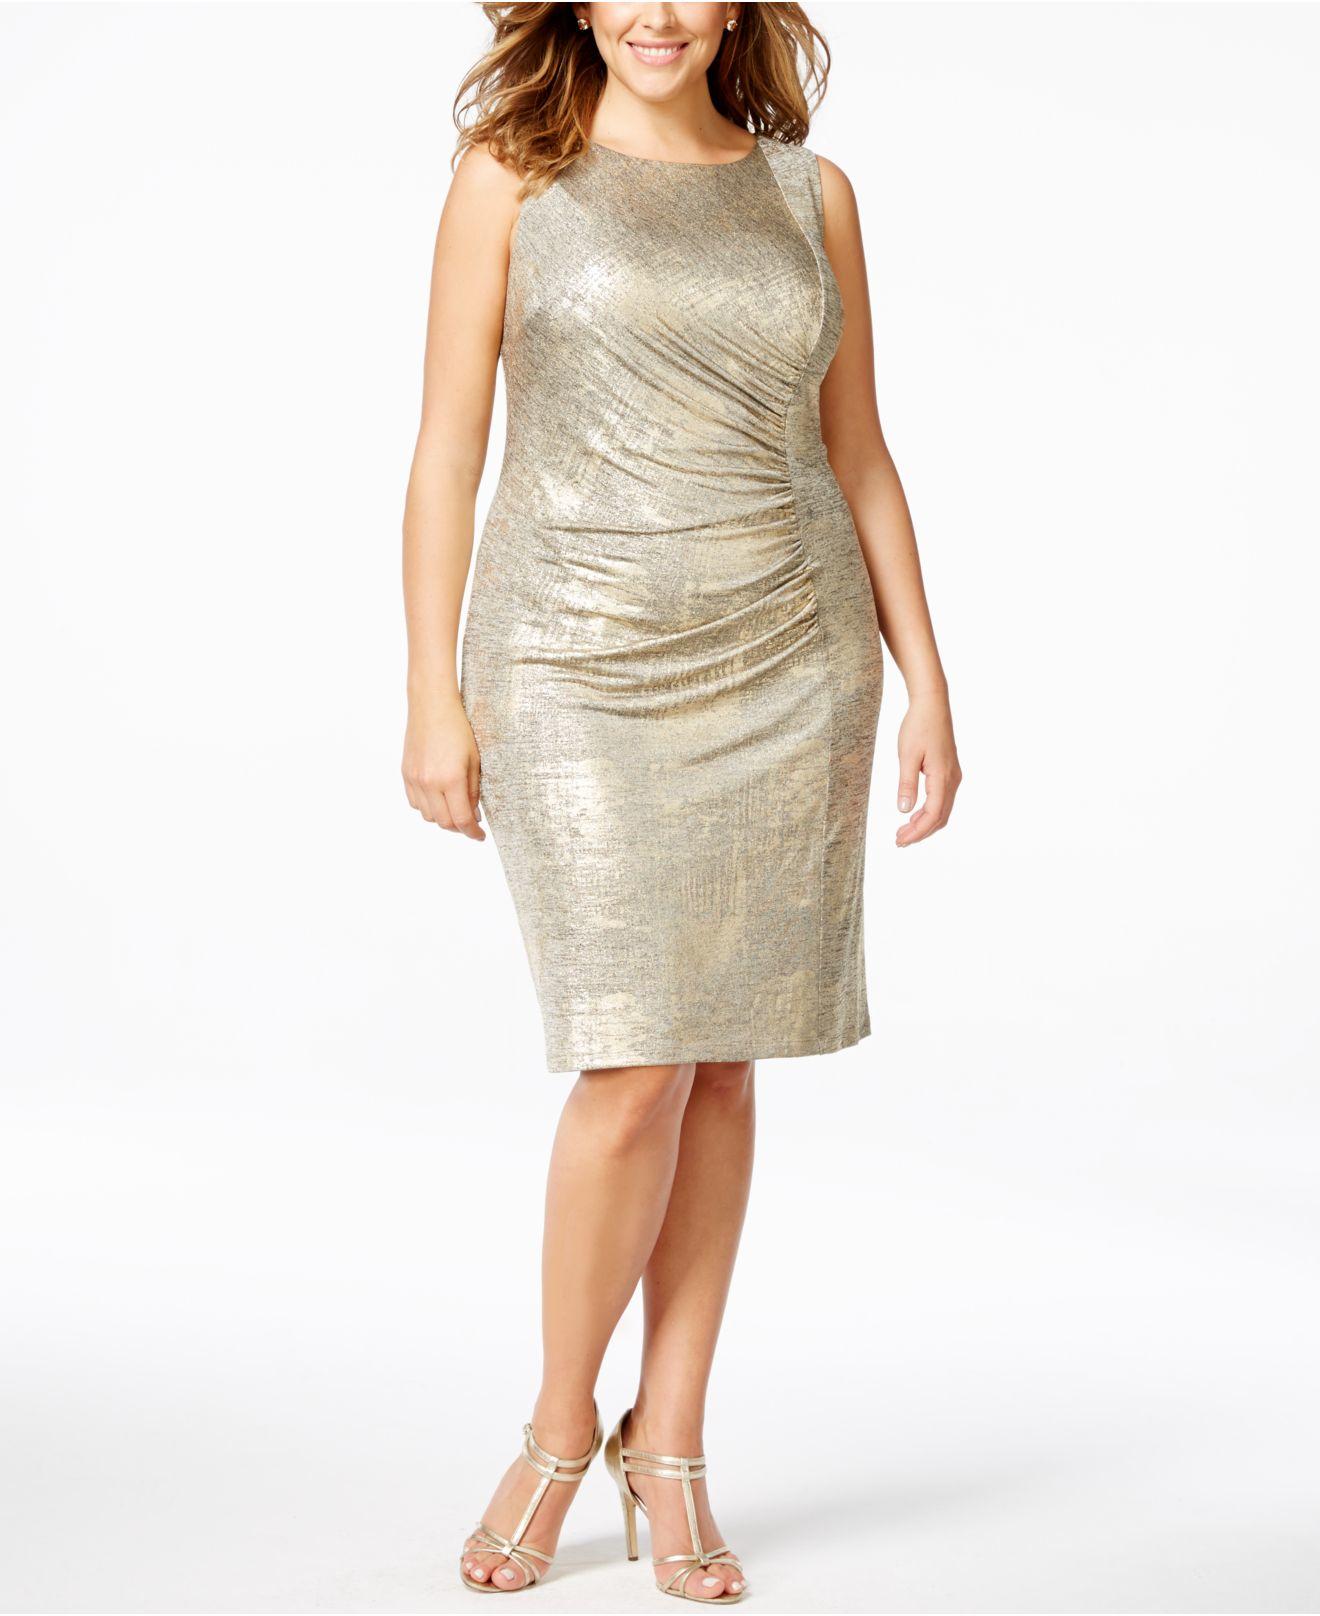 d92b8d14277 Lyst - Calvin Klein Plus Size Ruched Metallic Sheath Dress in Metallic